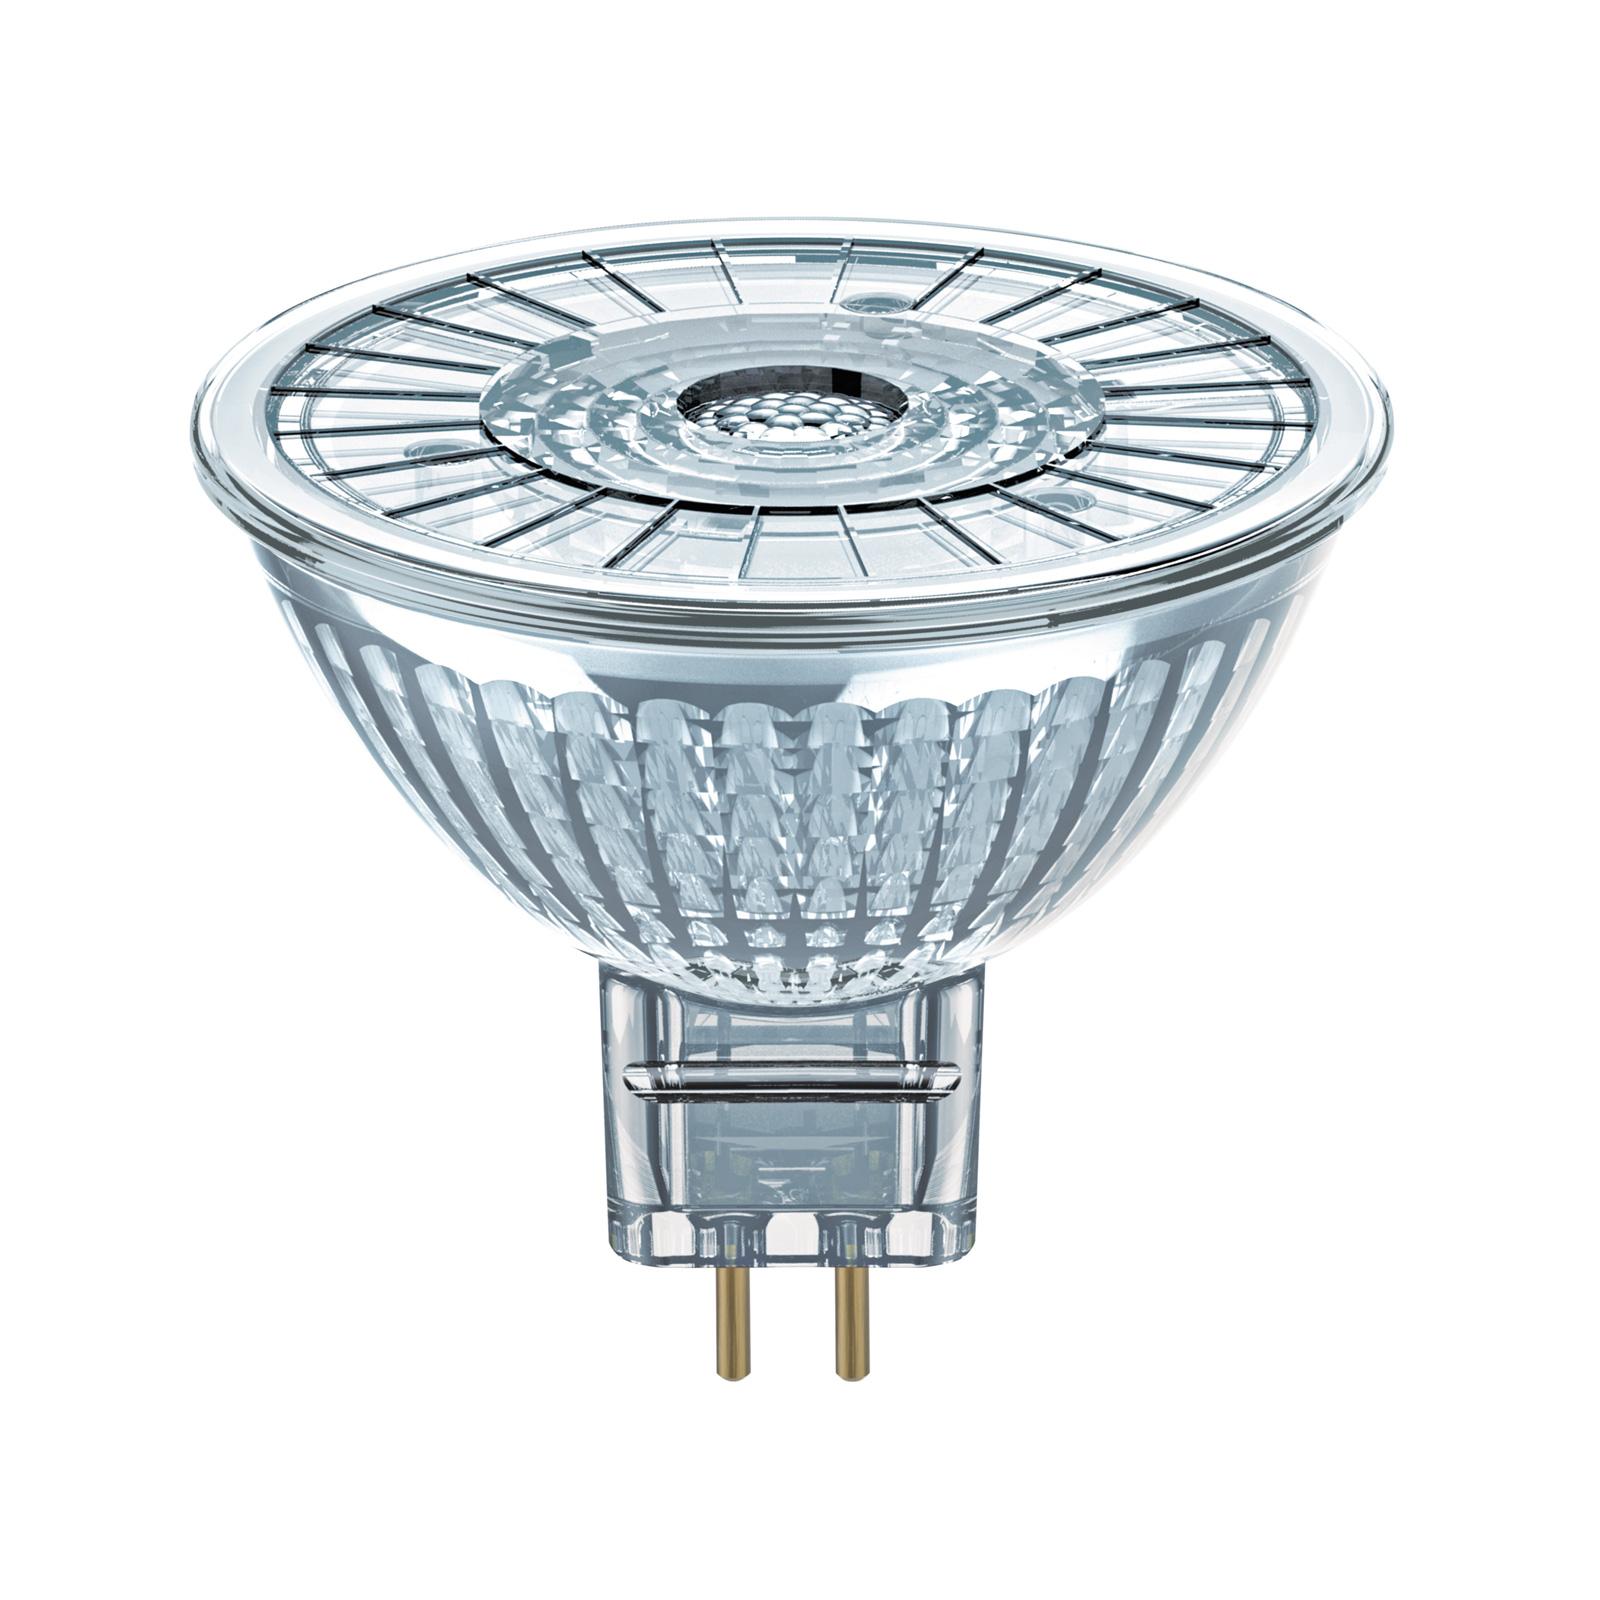 osram parathom pro mr16 gu5 3 5w 20 watt 230lm 36 warmwei dimmbar 90 ra ebay. Black Bedroom Furniture Sets. Home Design Ideas